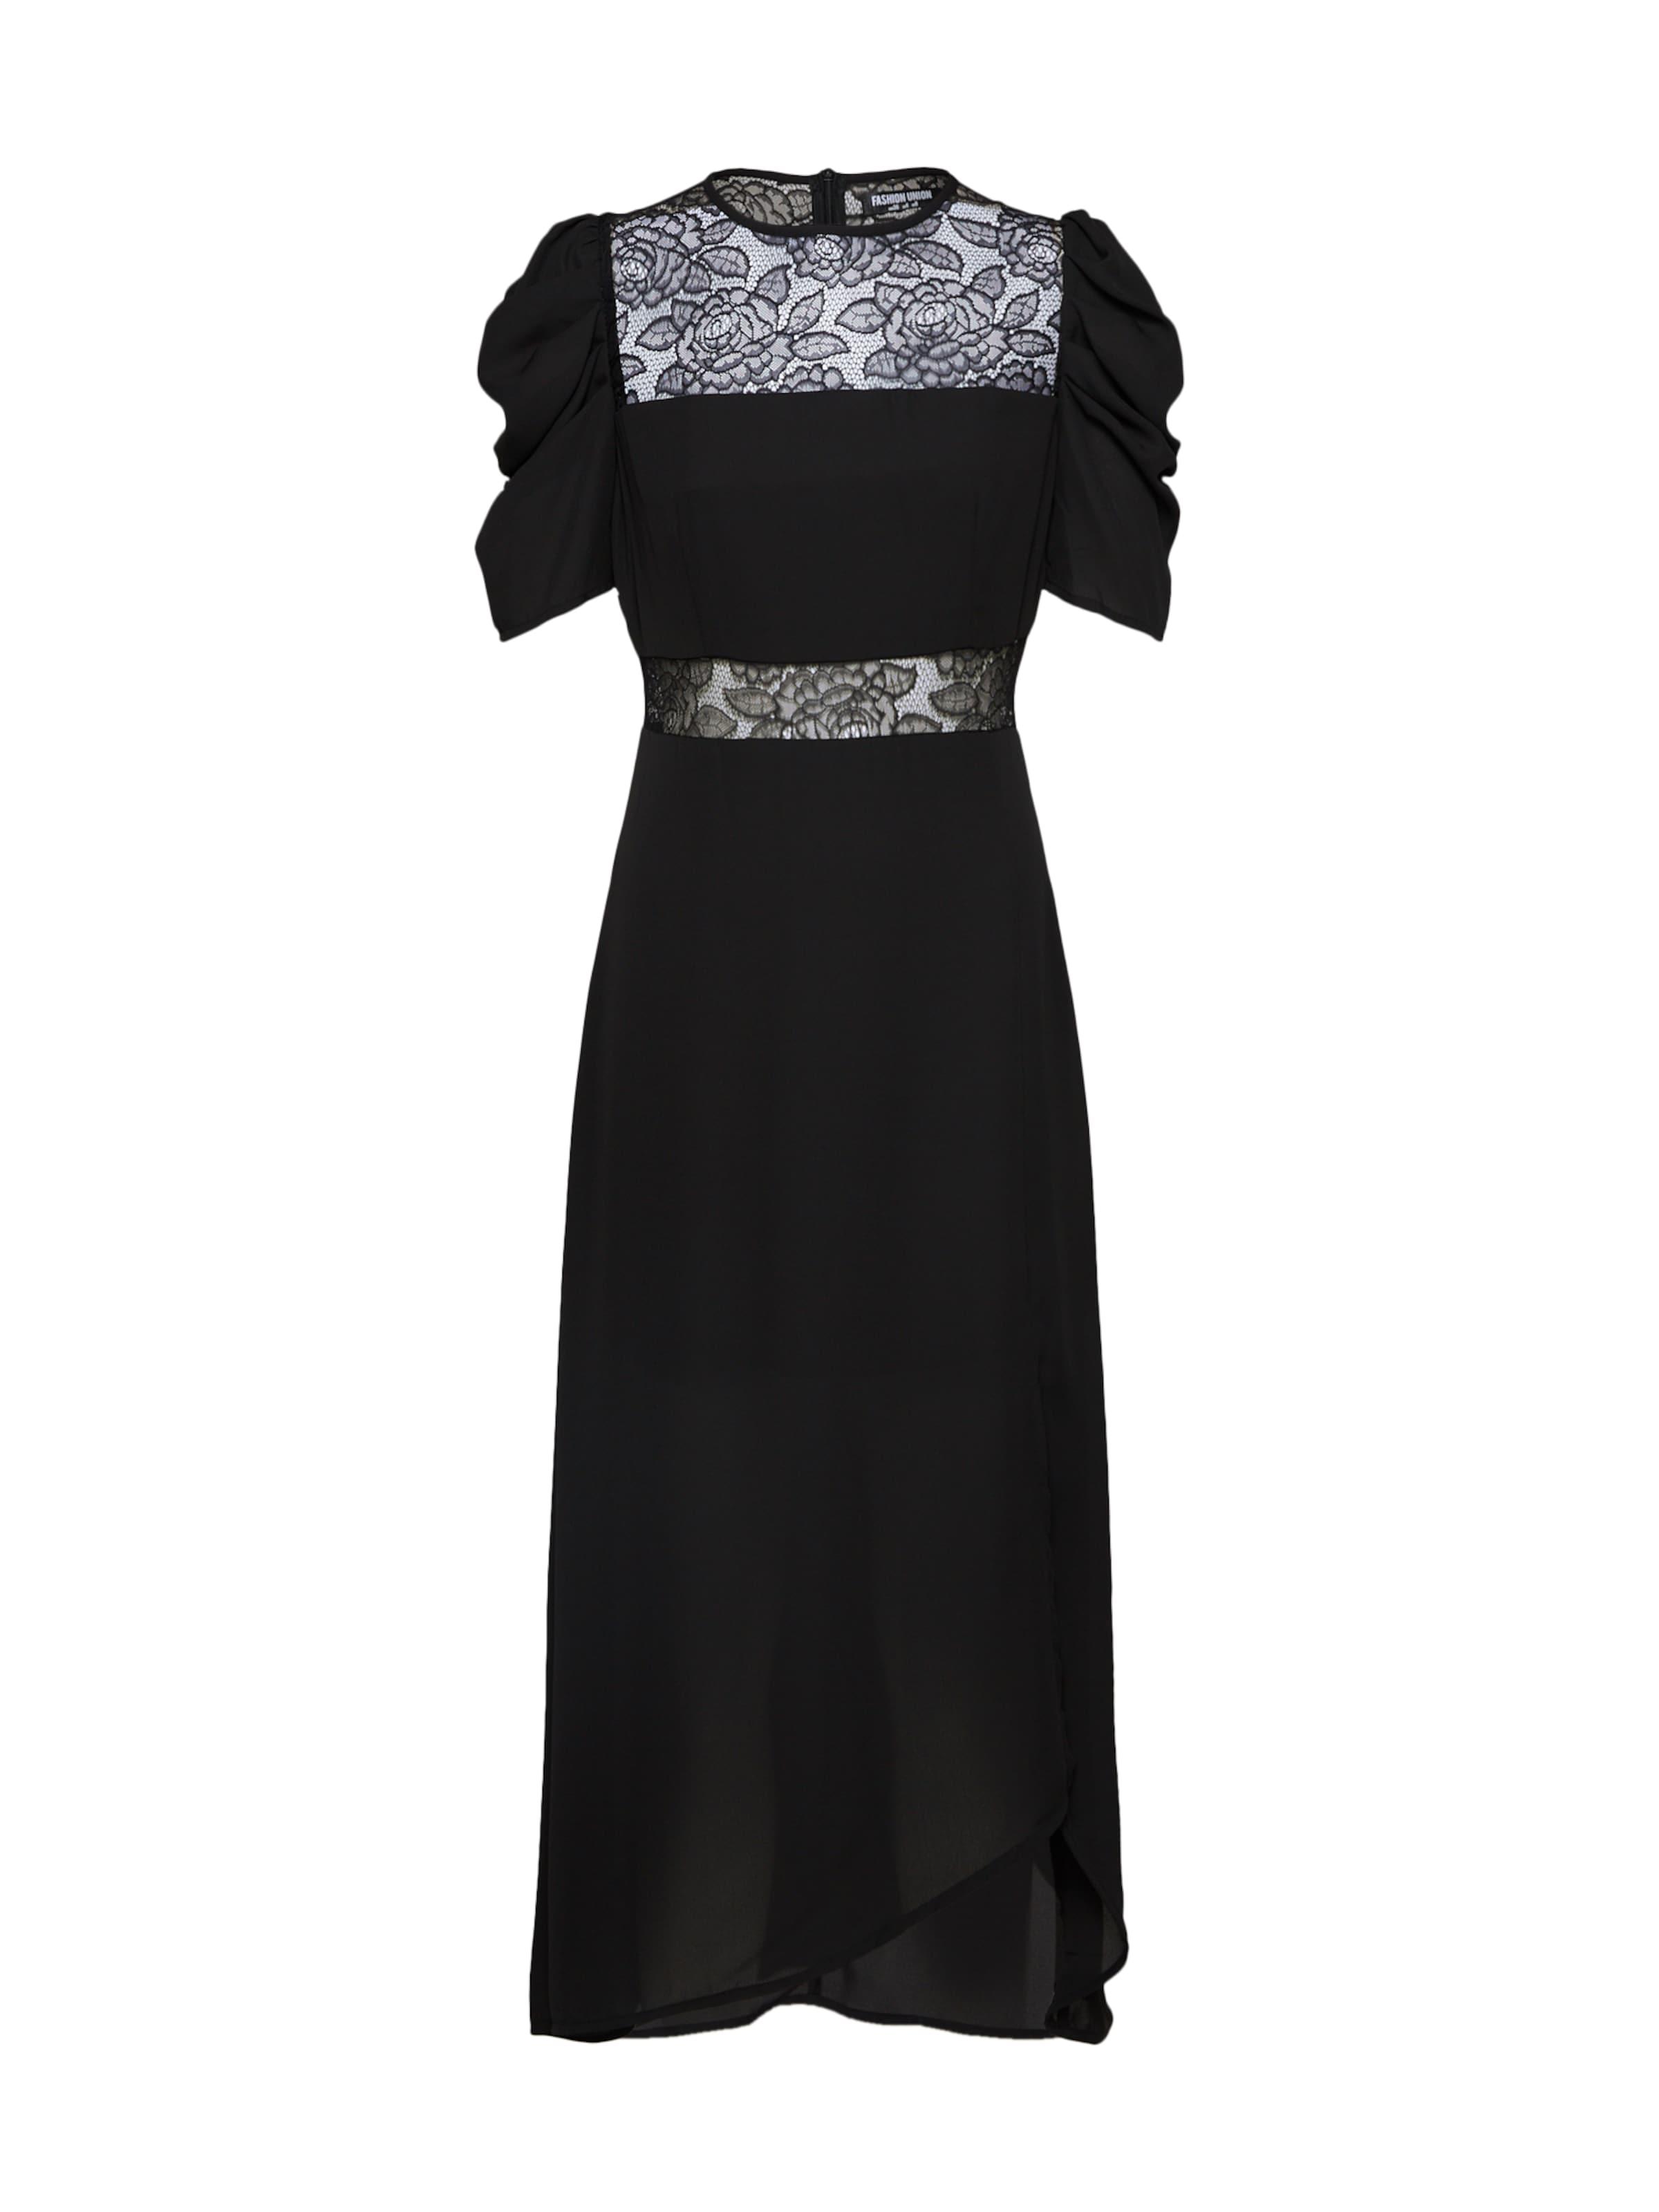 Union Robe Fashion Noir 'emo' En ZiPXuOk